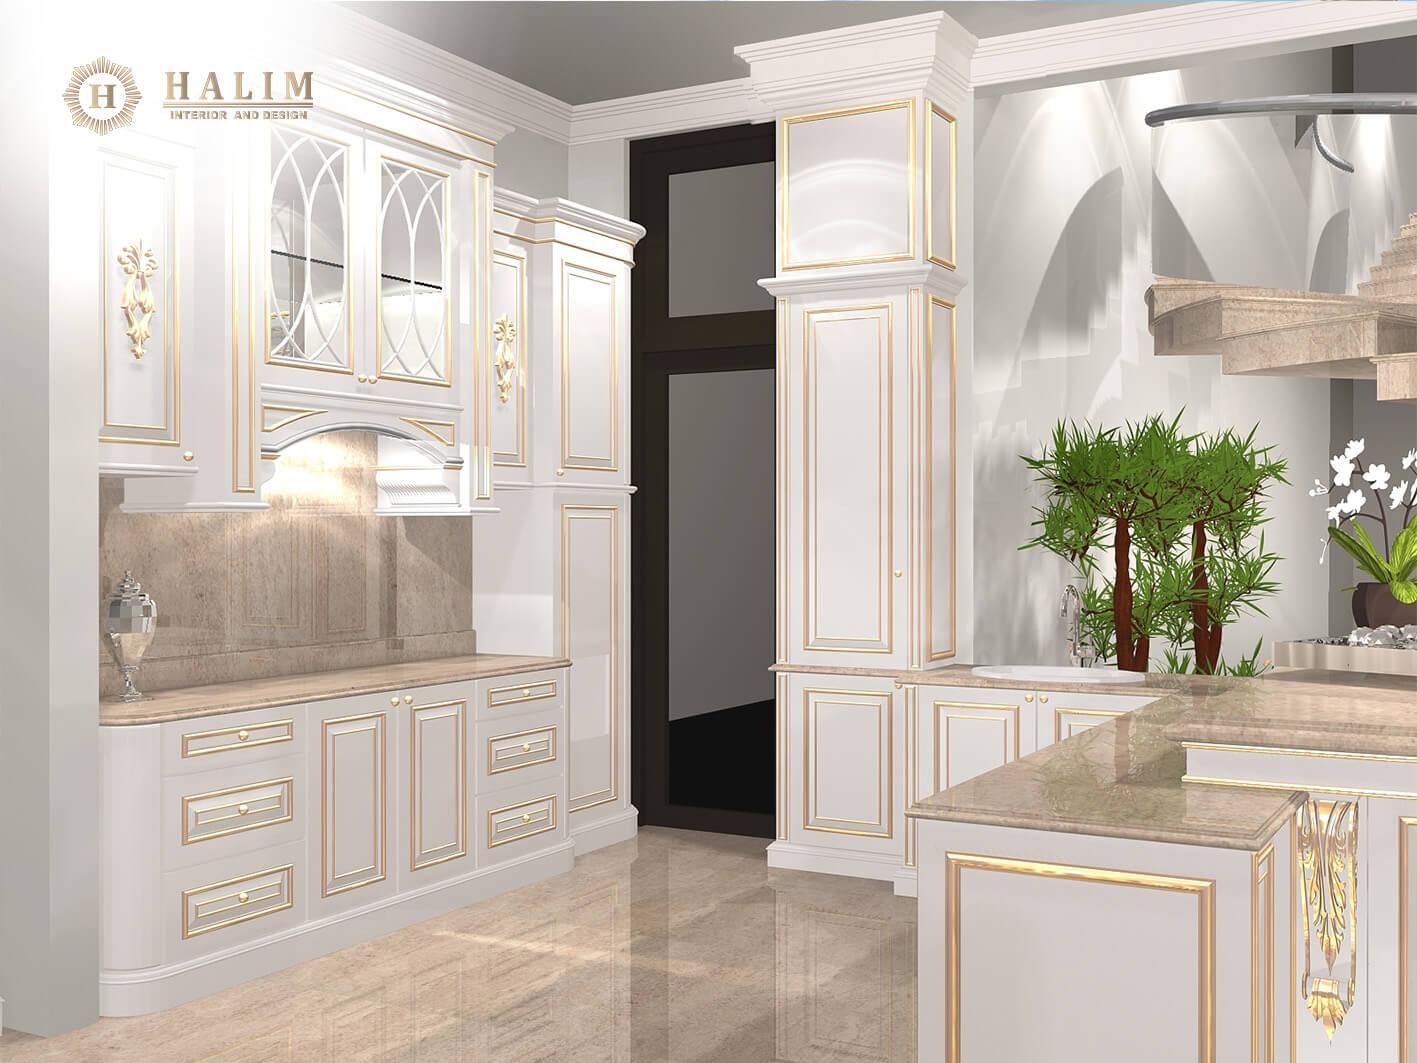 Halim-Interior-modern-furniture-contemporer-american-style-minimalist-european-classic-surabaya (2)